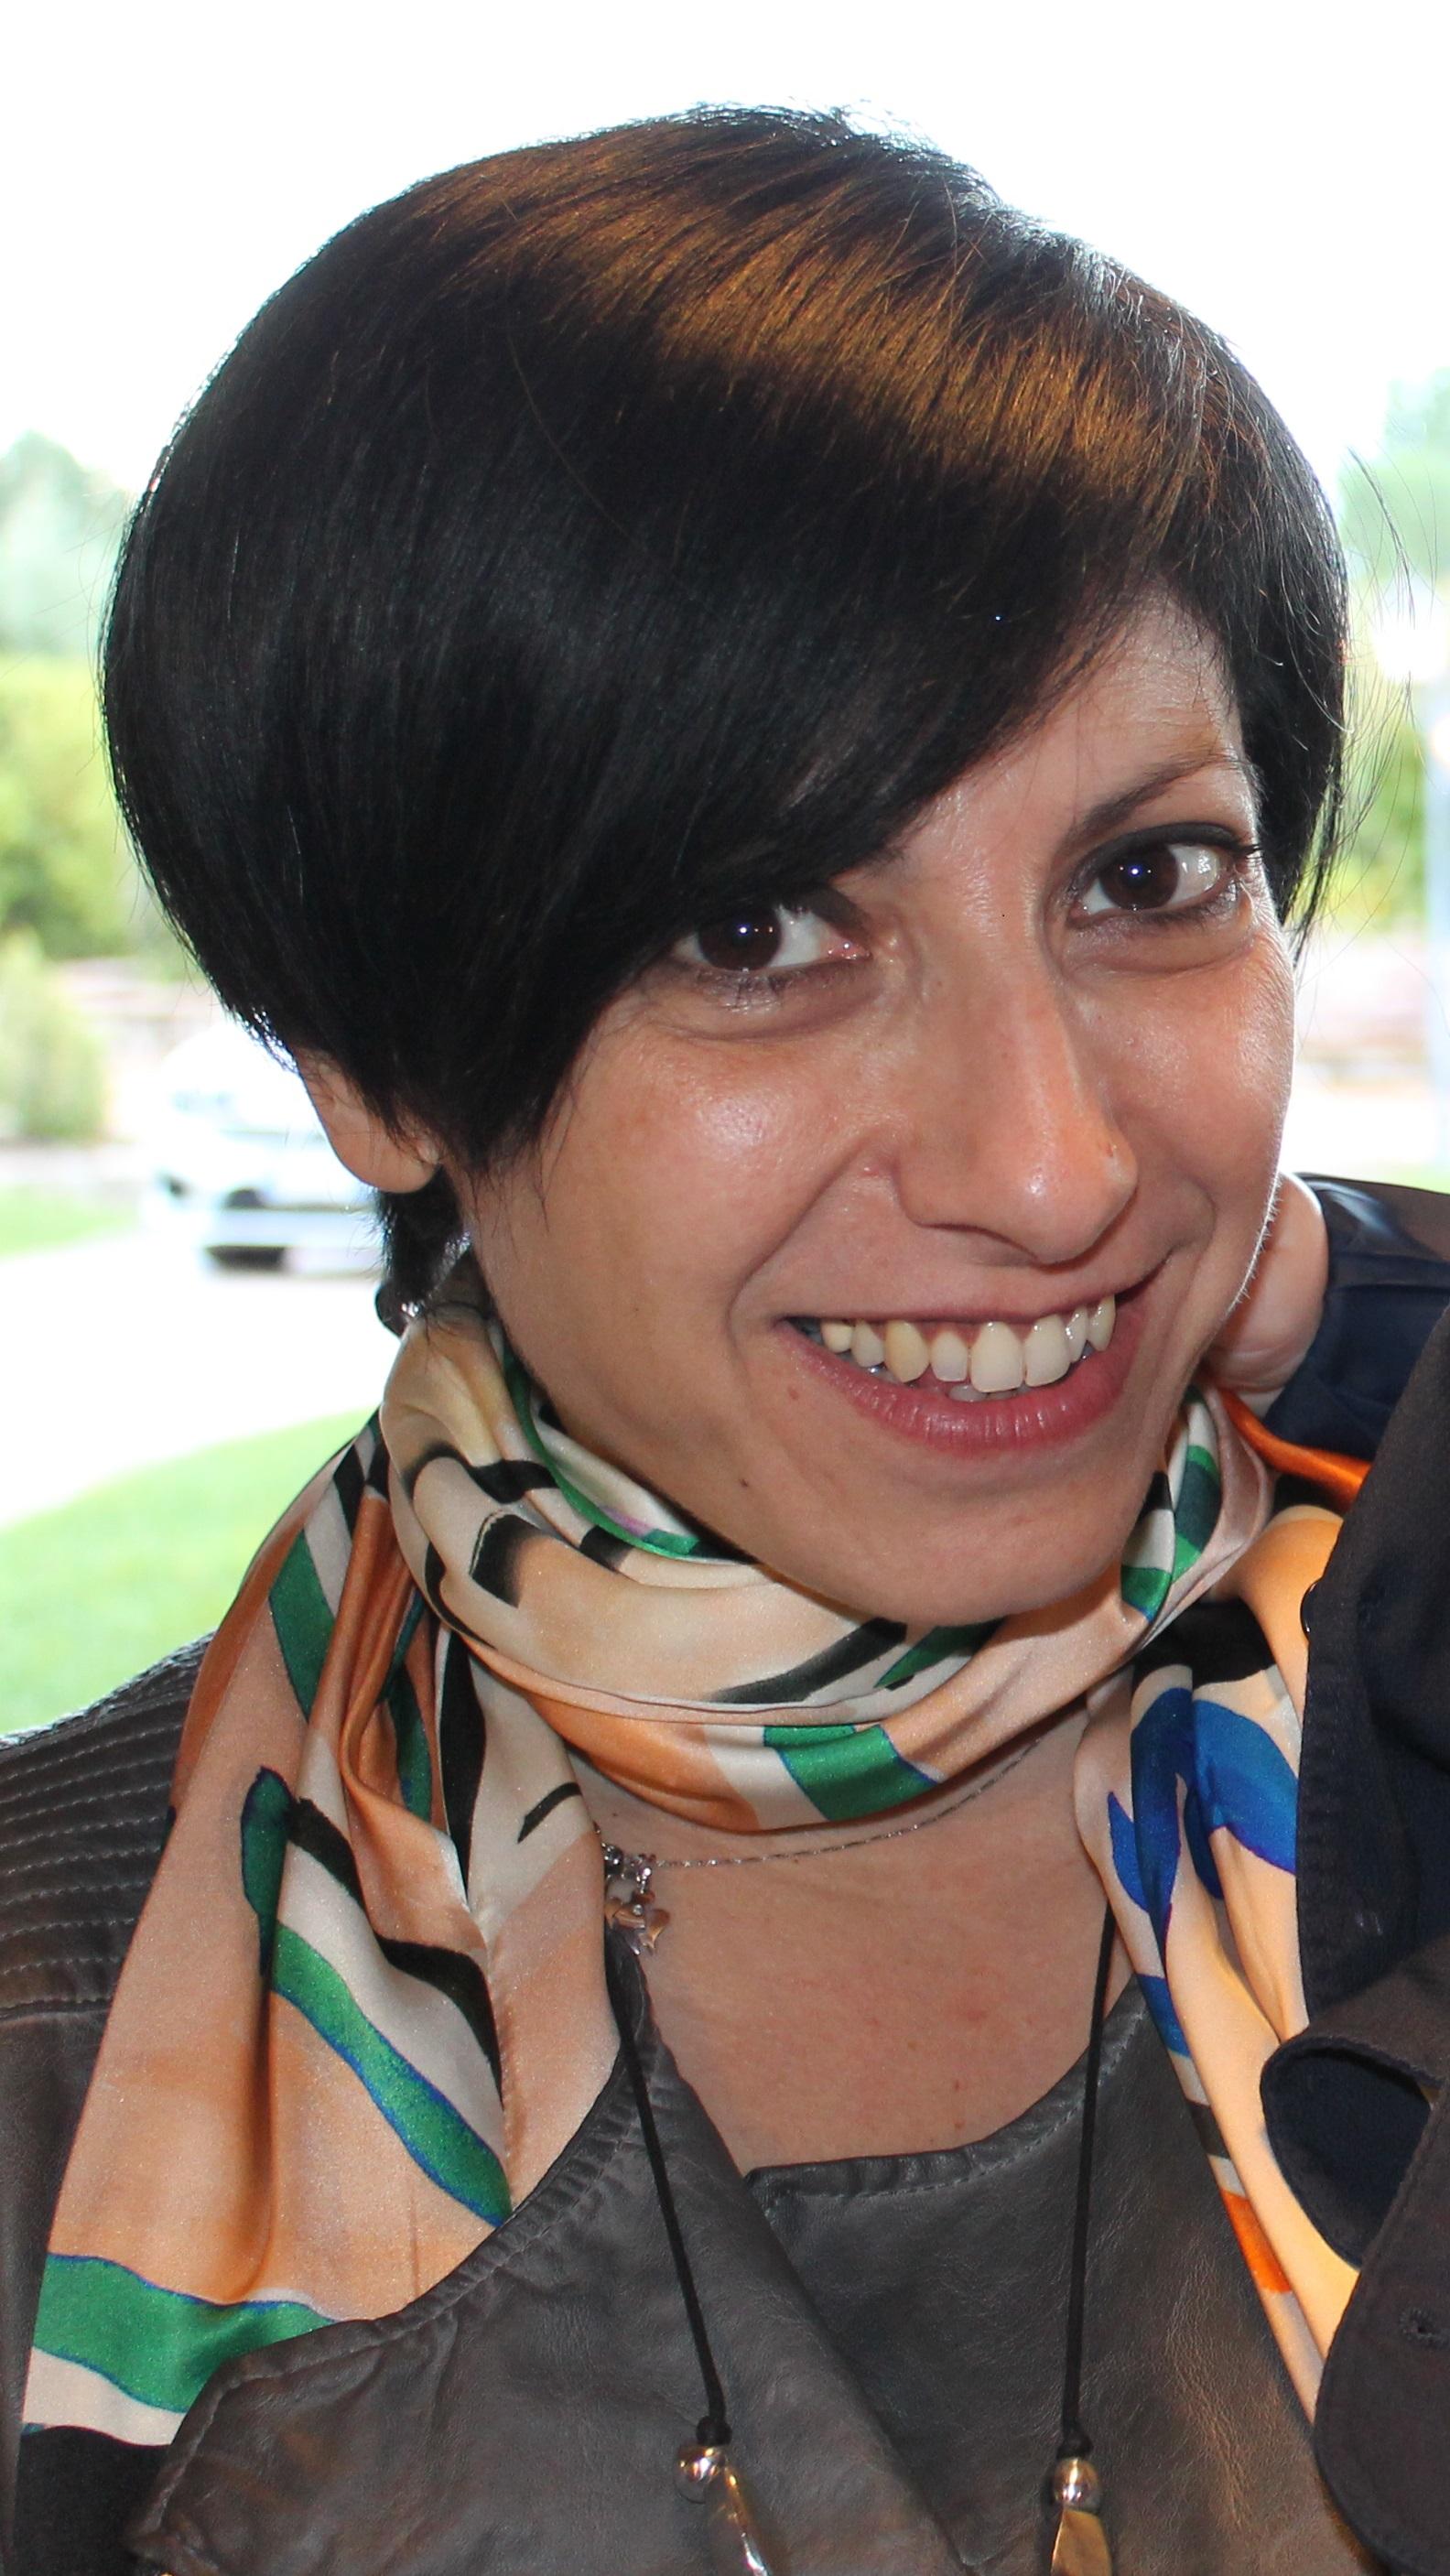 Natascia Belardoni